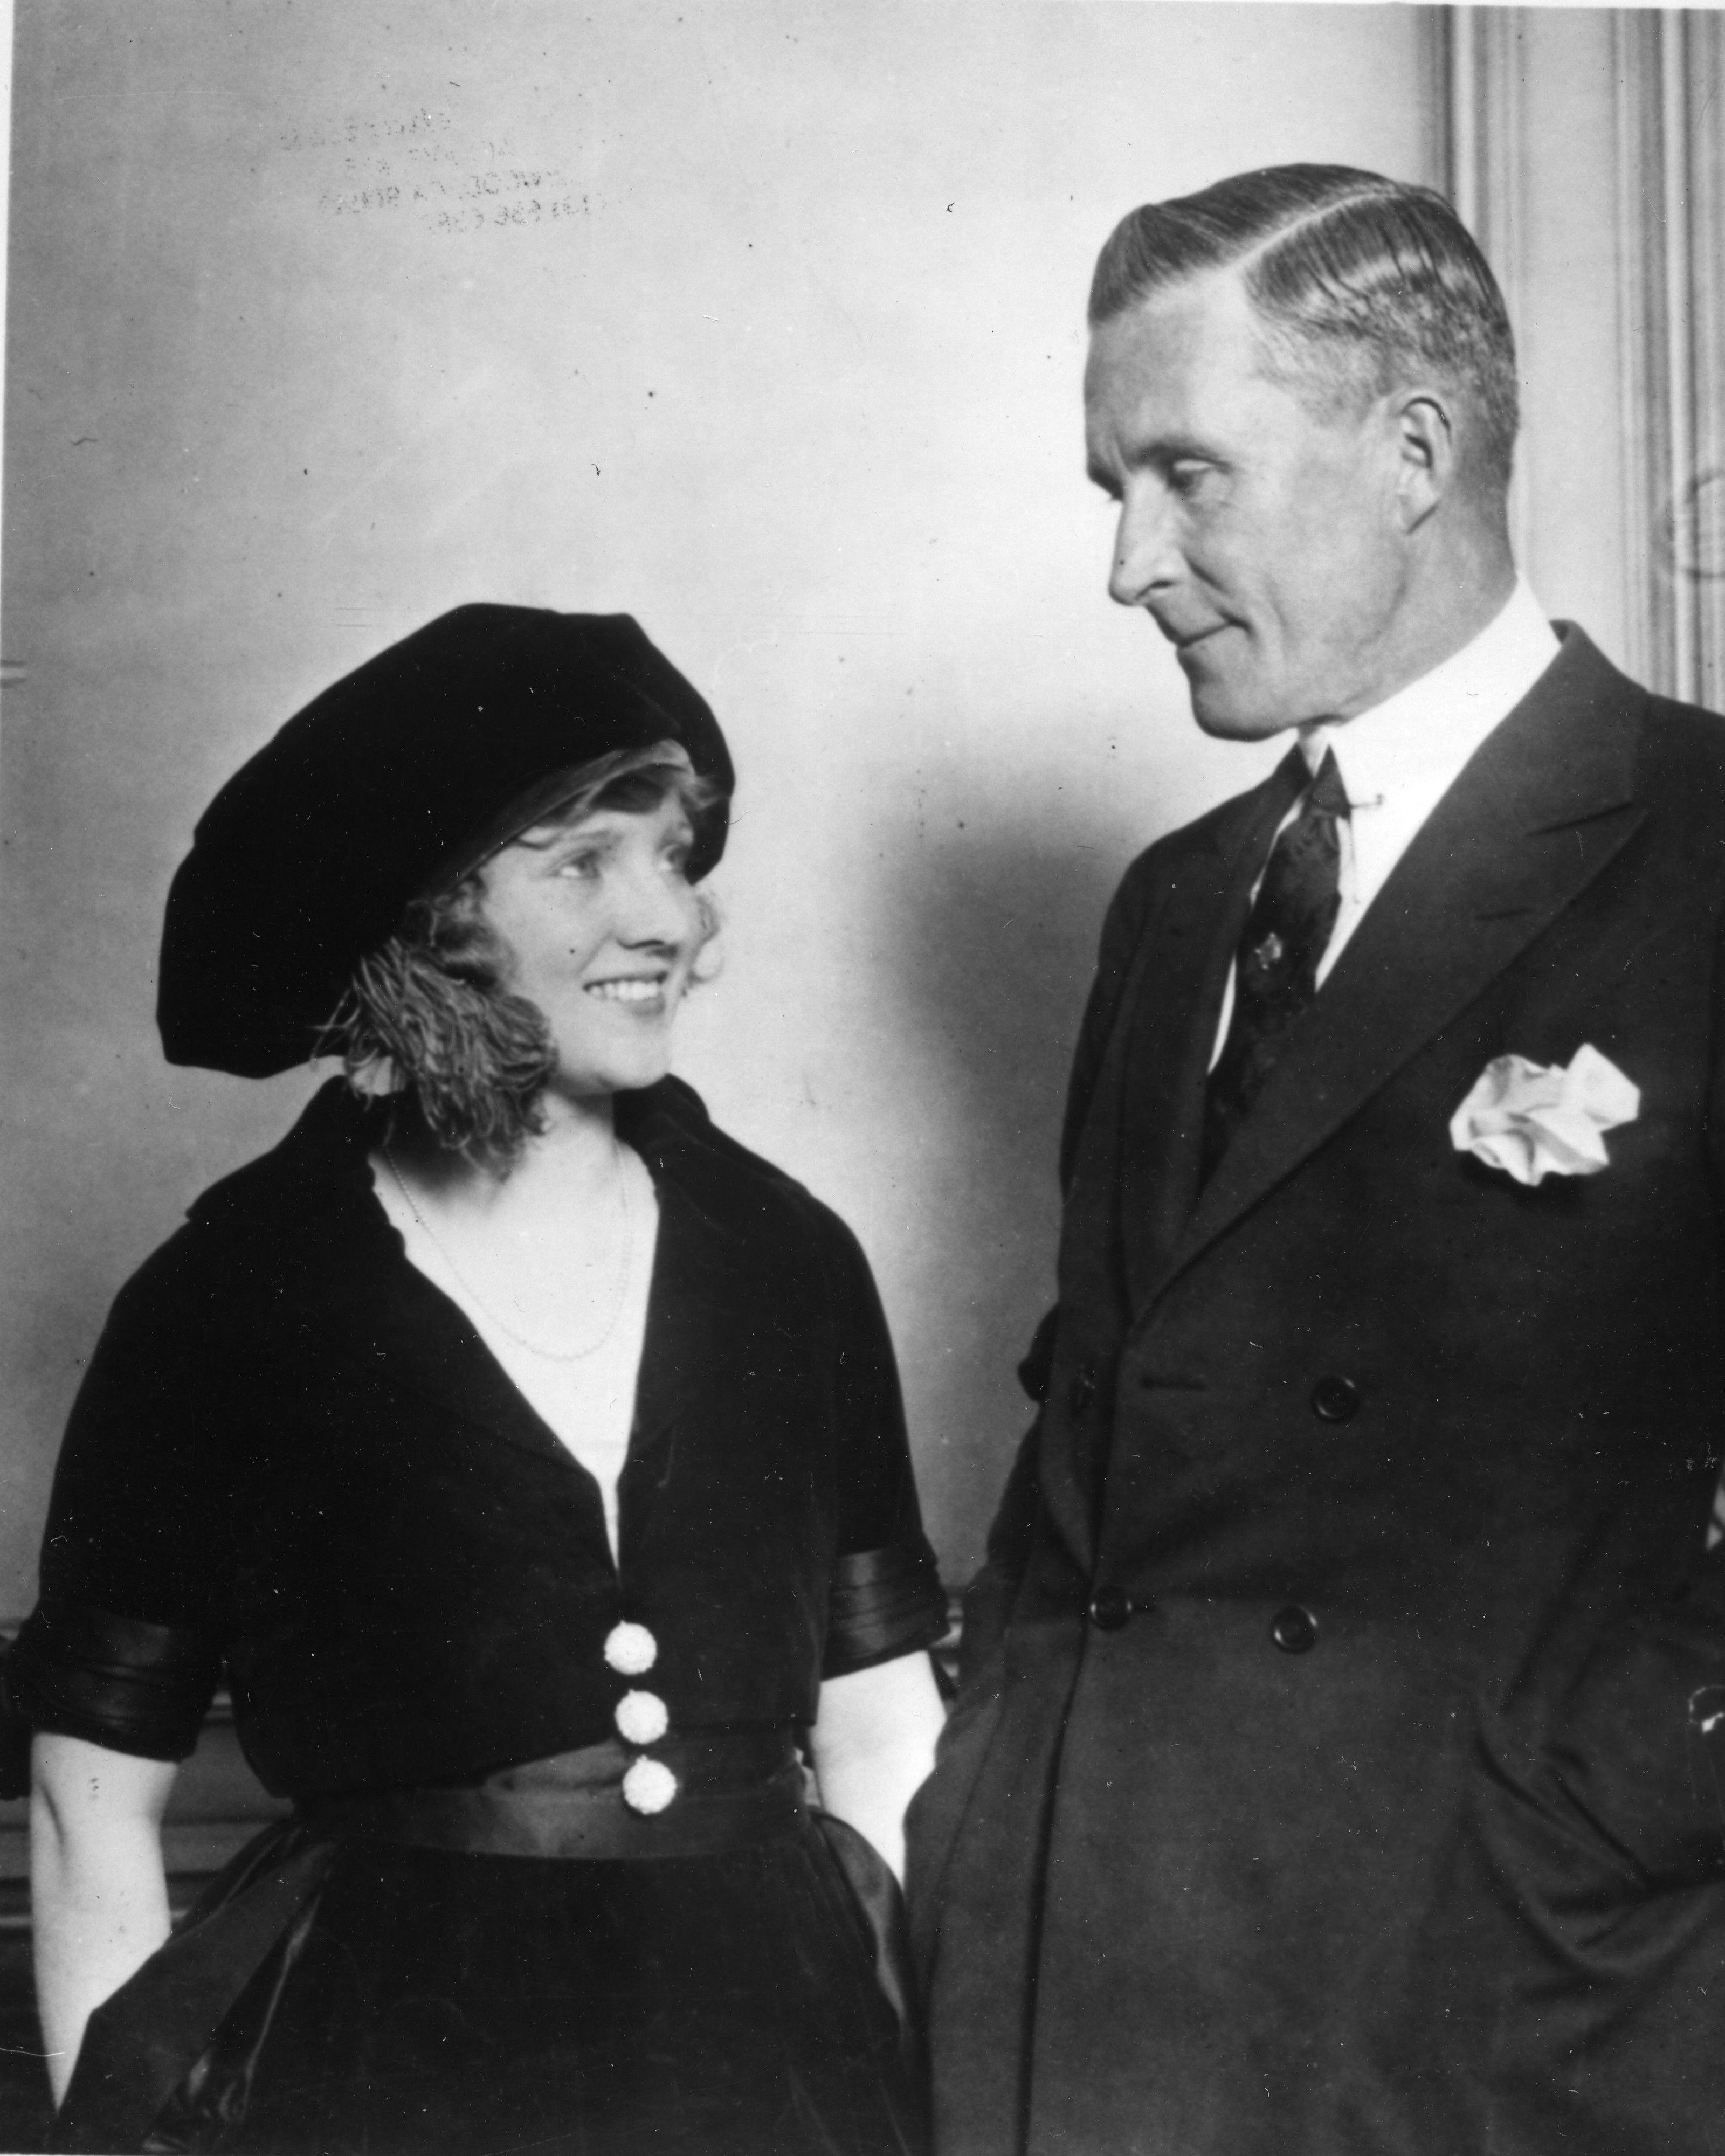 Melissa Tkautz,Jack Hawkins (1910?973) Erotic pics & movies Lyda Roberti,Helene Mayer foil fencer, Olympic champion